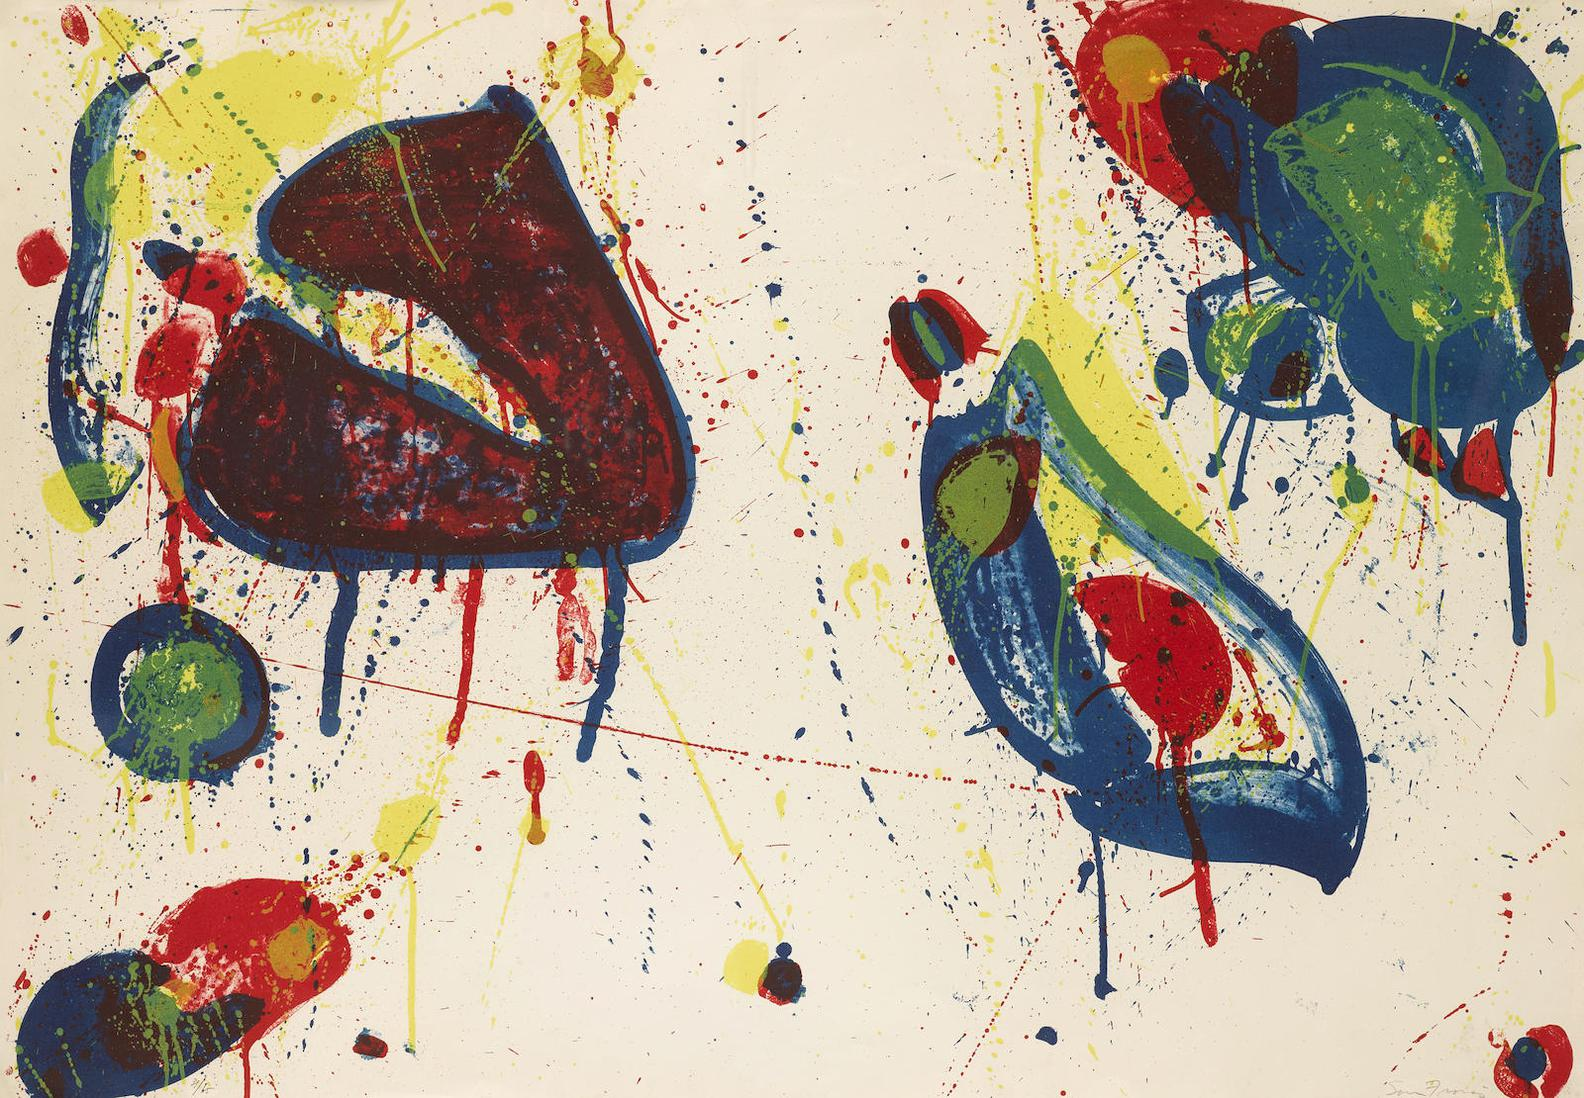 Sam Francis-Heart Stone (L. 31; Sf-30)-1963